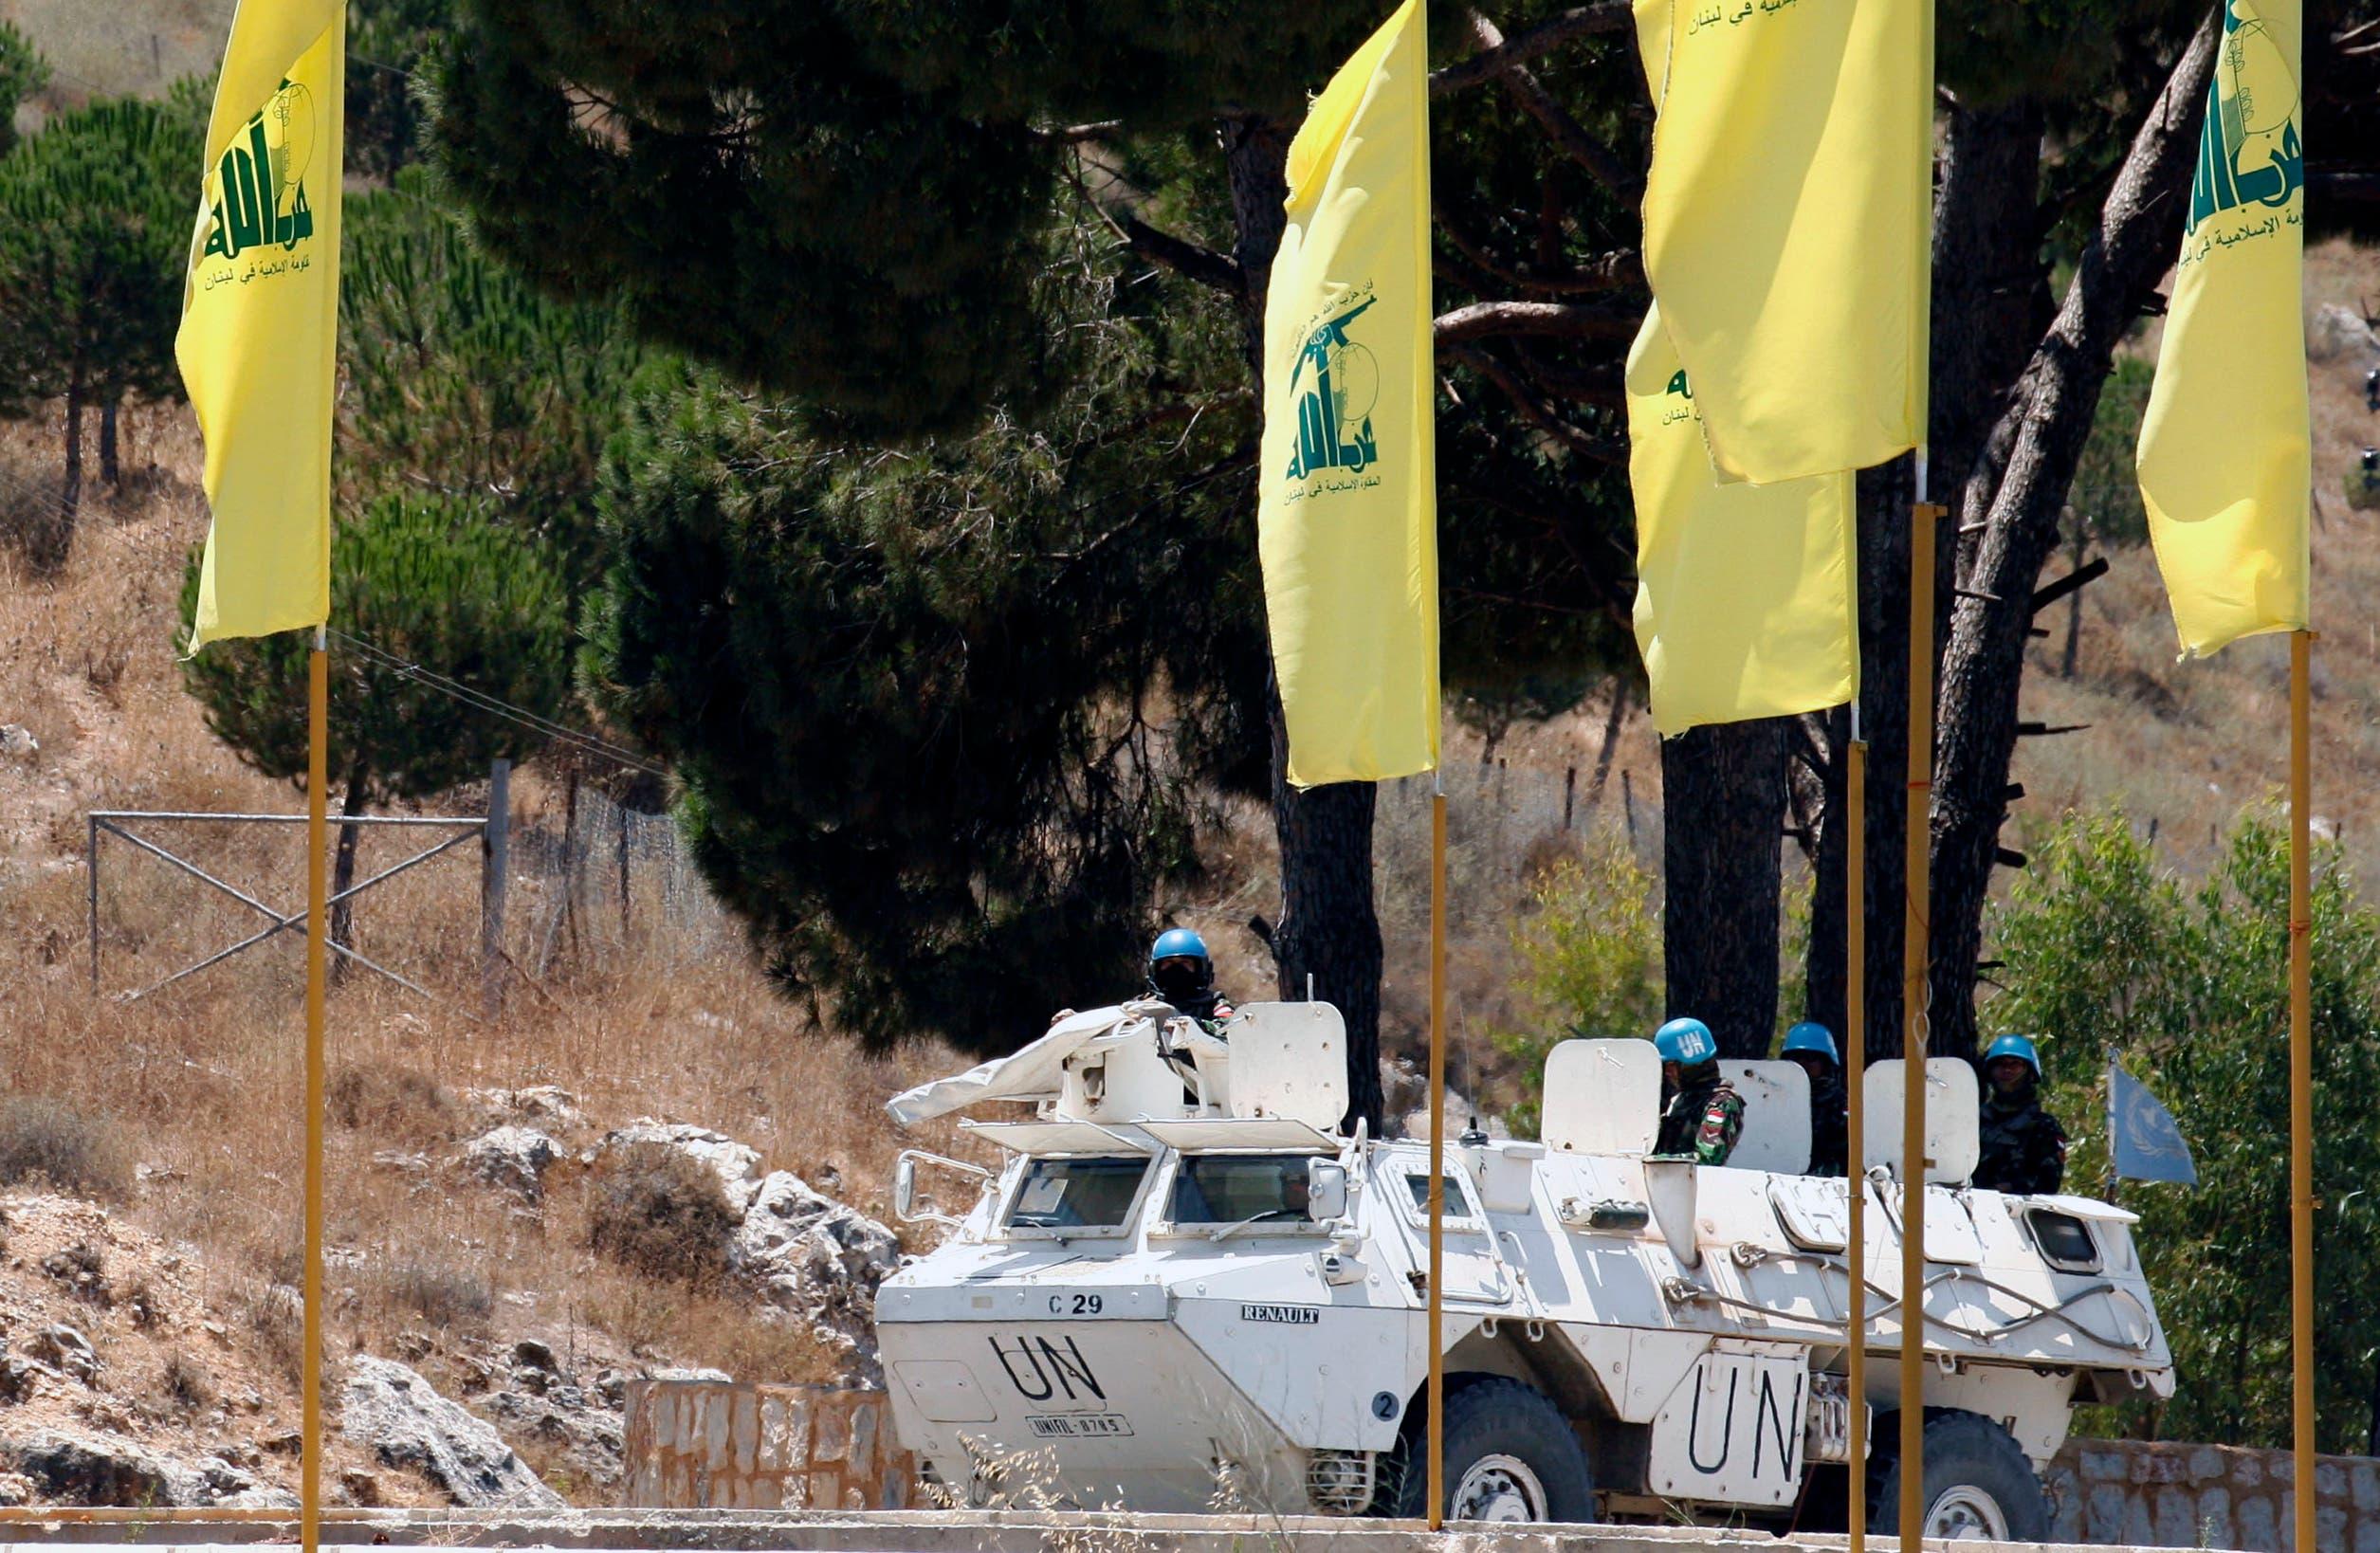 UN peacekeepers patrol past Hezbollah flags on July 23. (AFP / Mahmoud Zayyat)